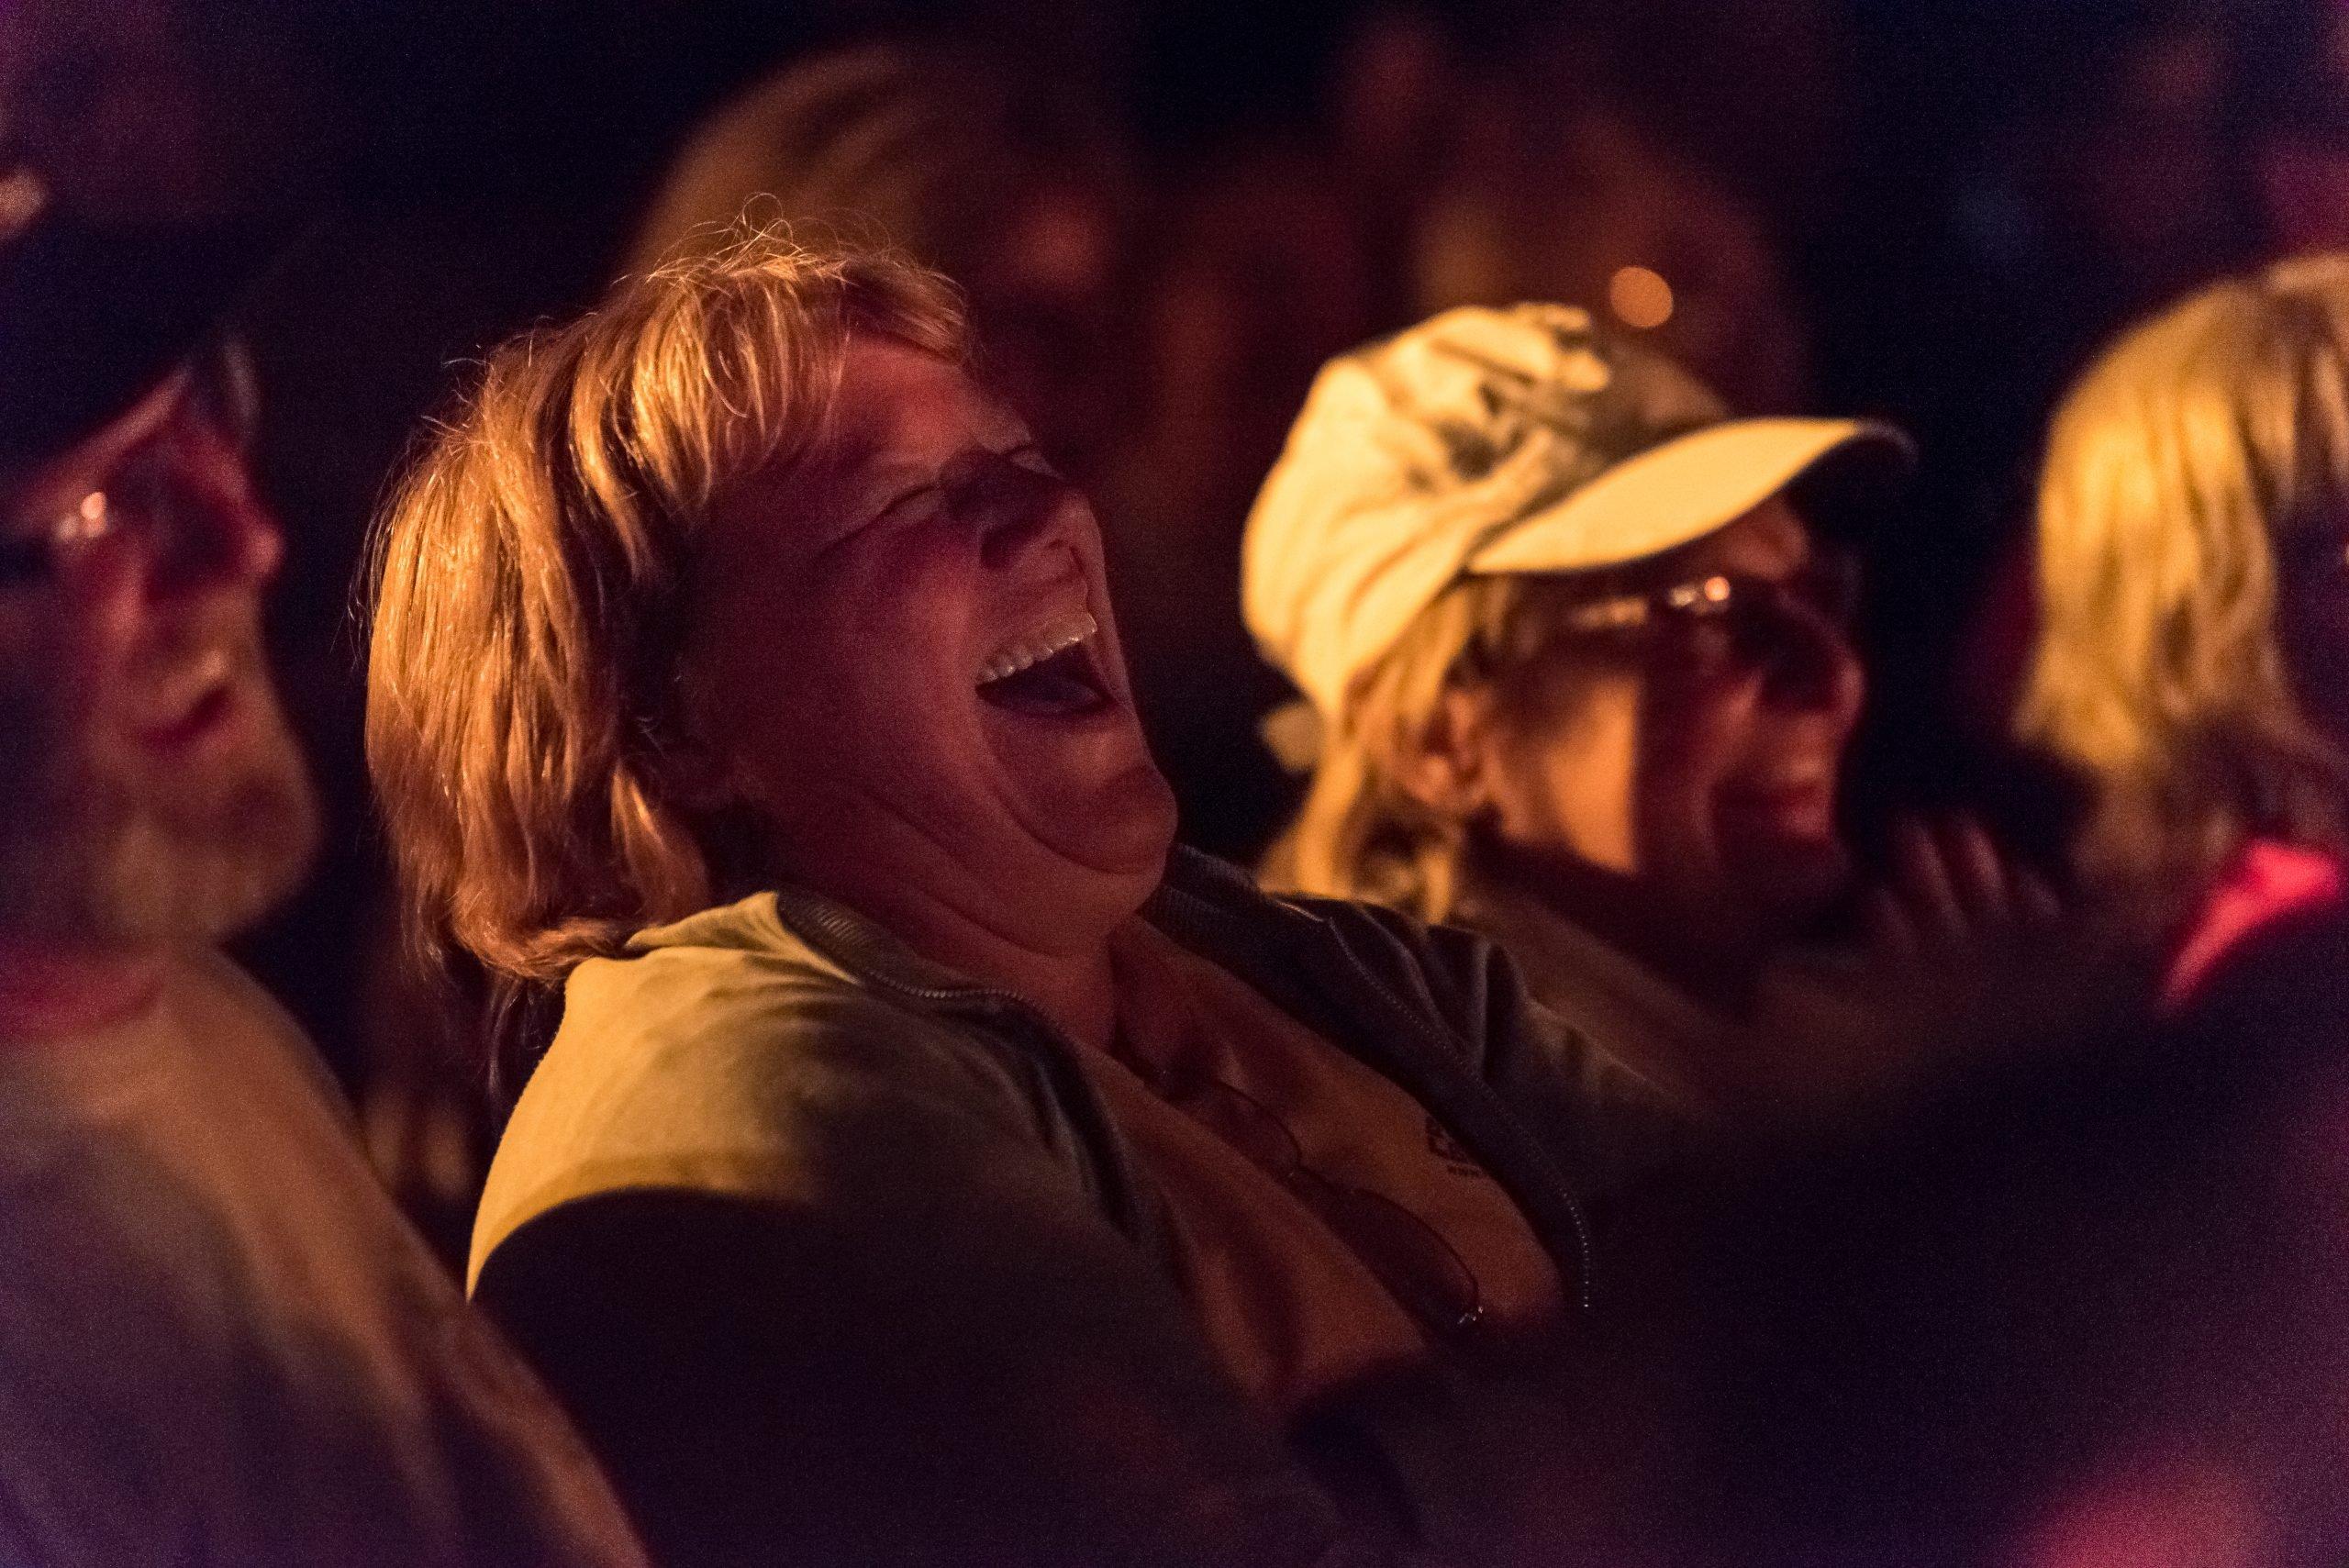 Laughing audience member